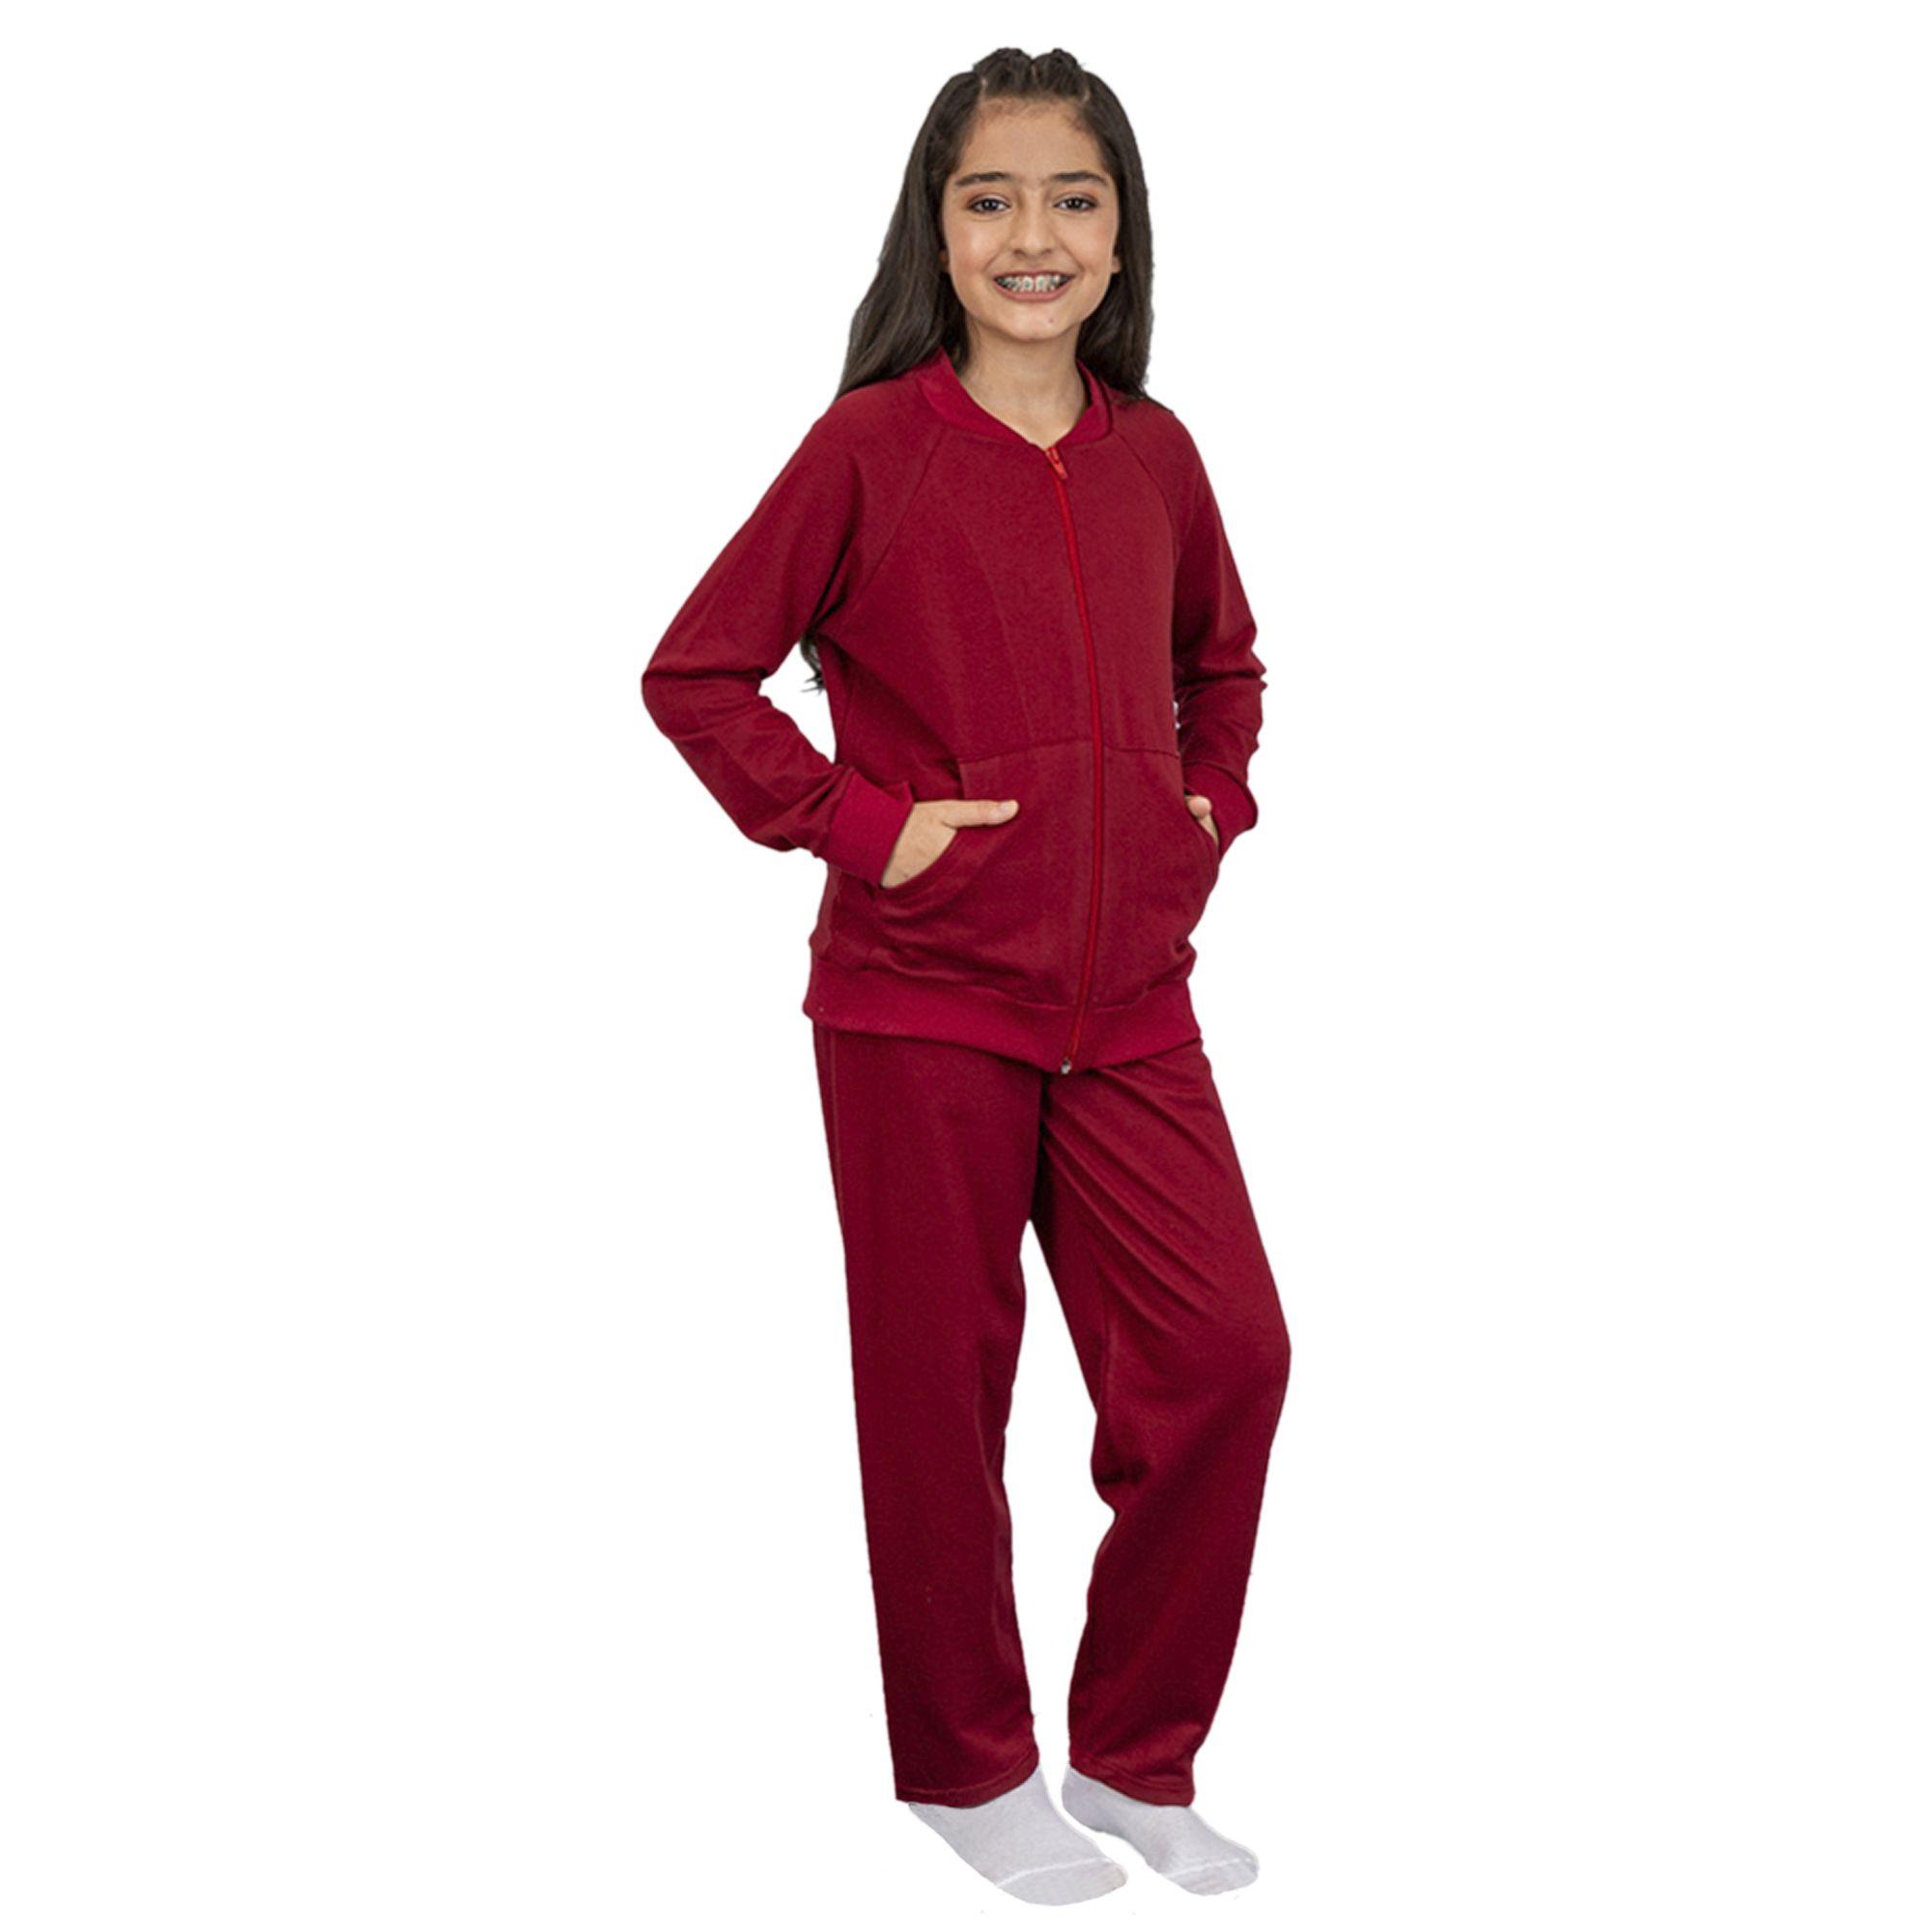 conjunto-moletom-infantil-meninas-com-ziper-vermelho